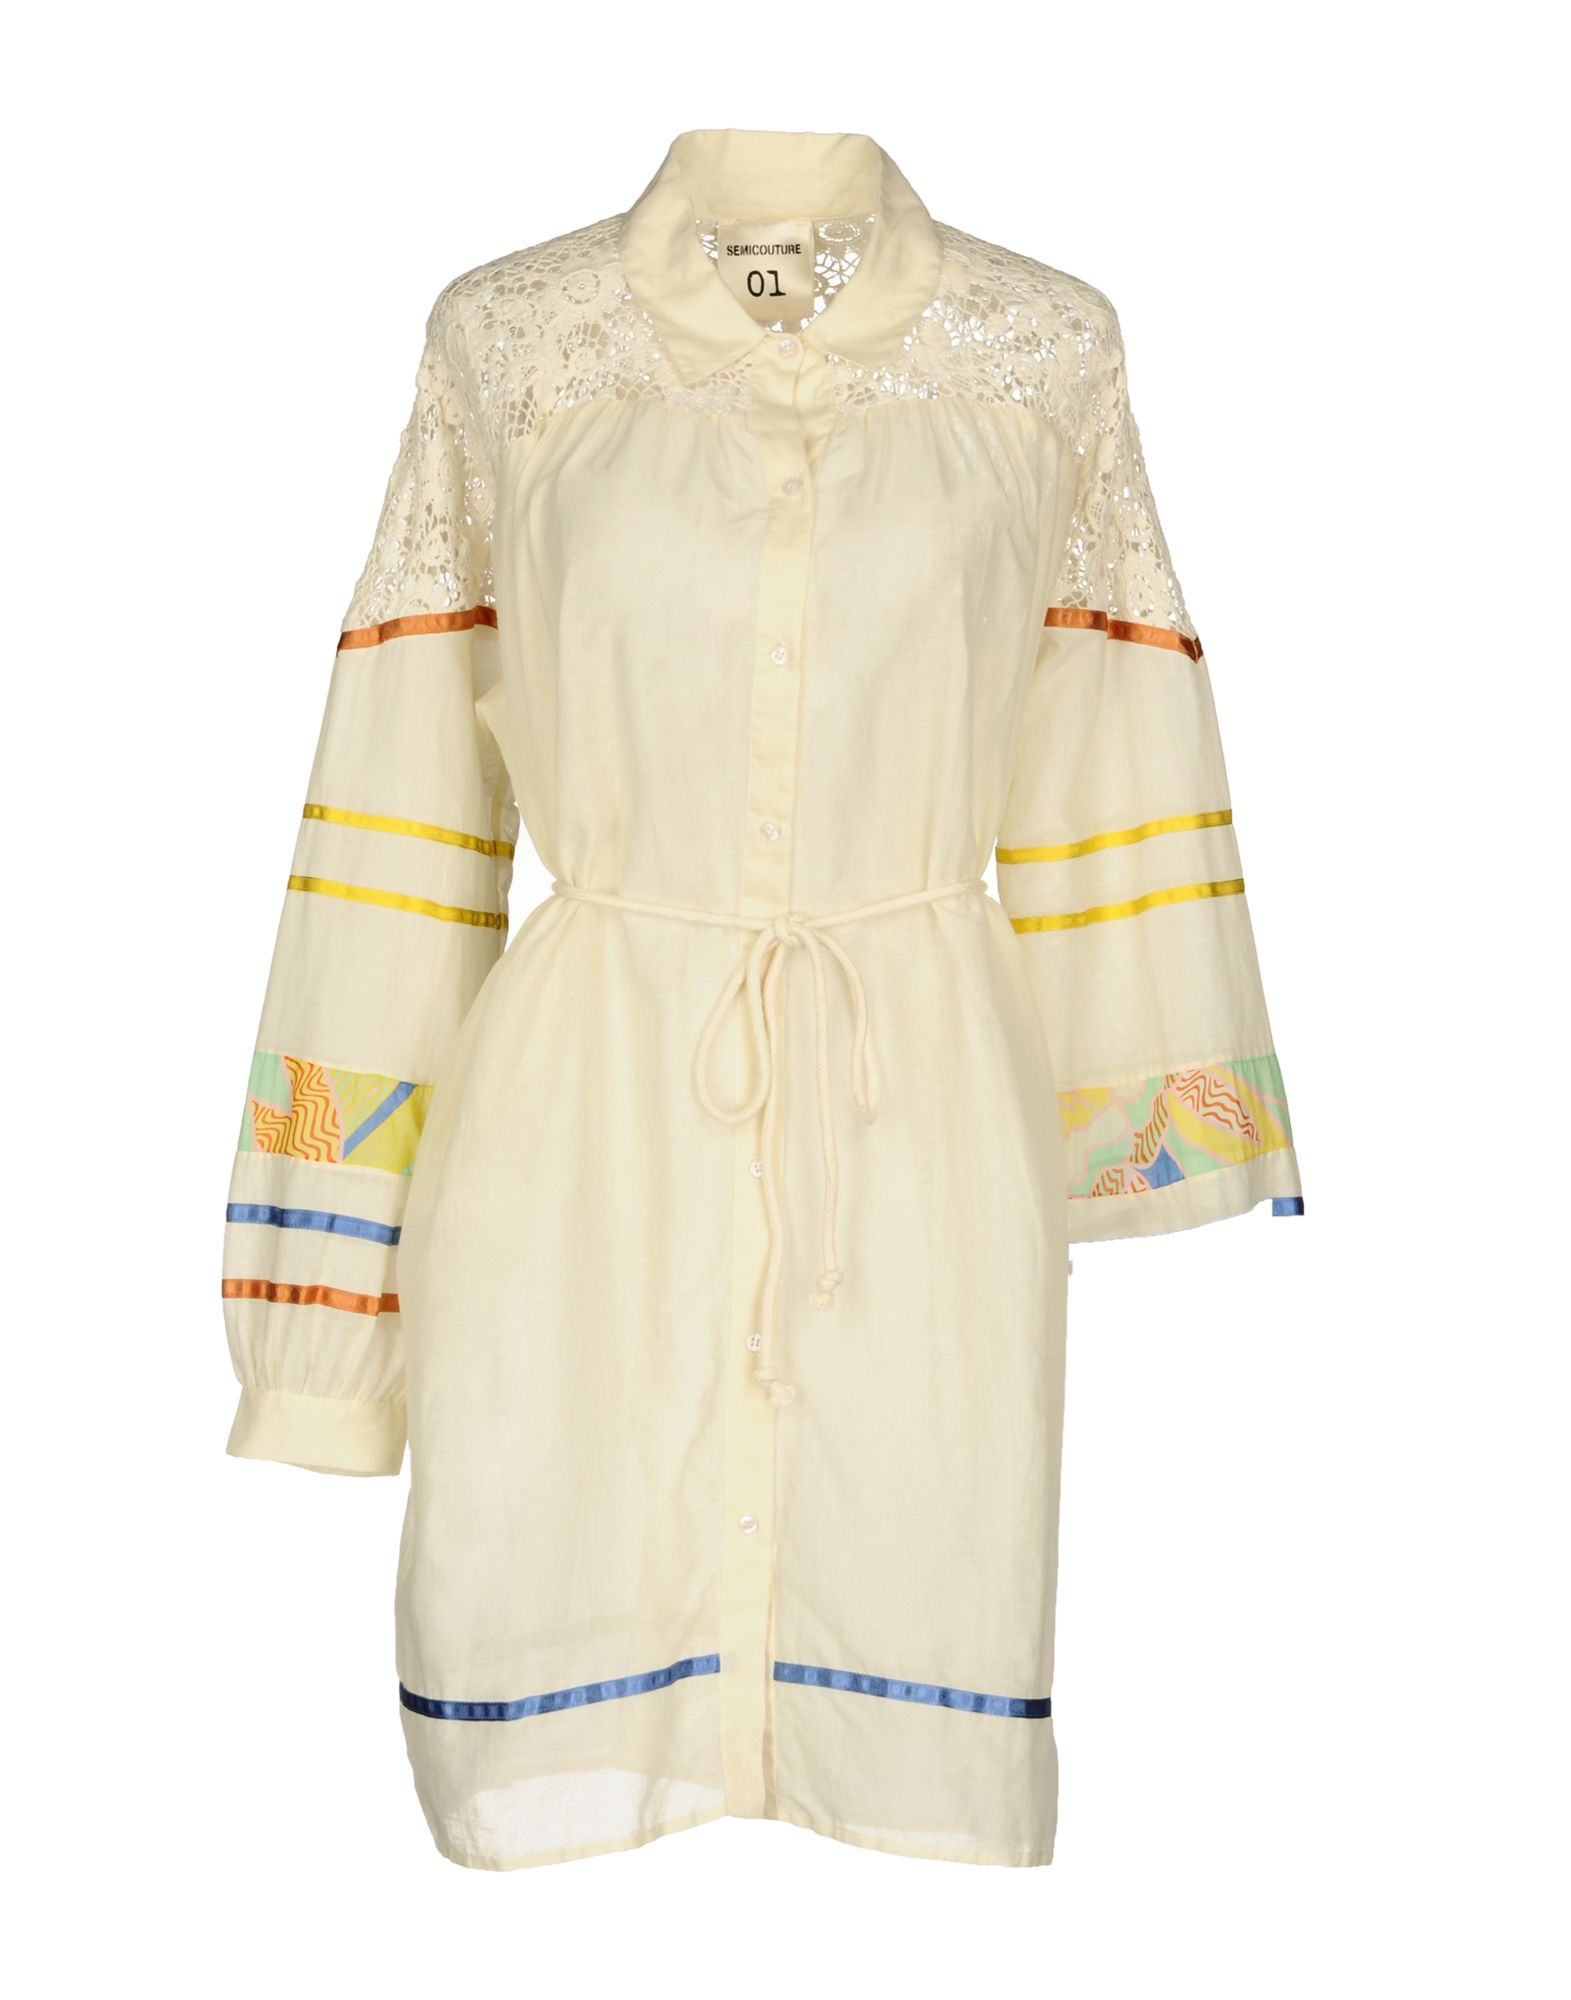 ФОТО semicouture Короткое платье